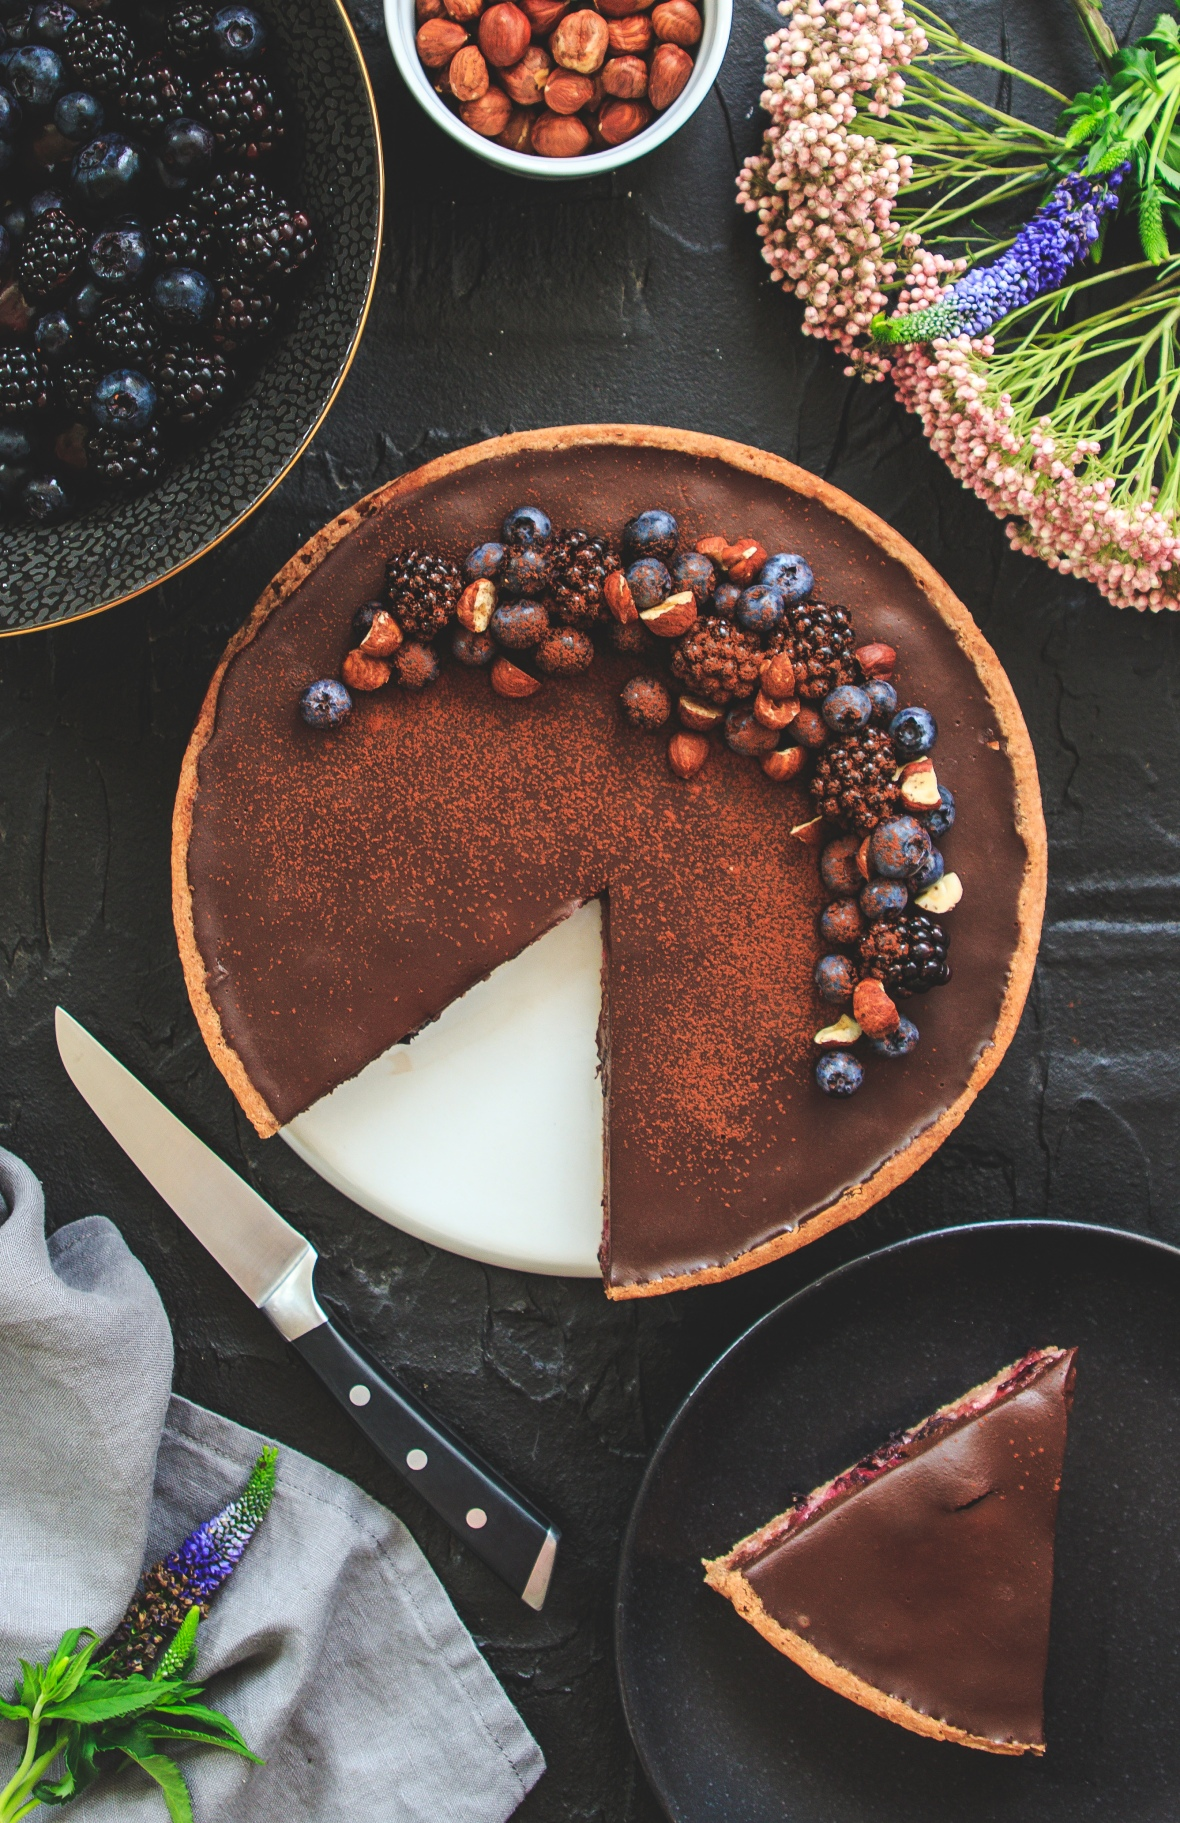 Čokoládový koláč s ostružinami a borůvkami